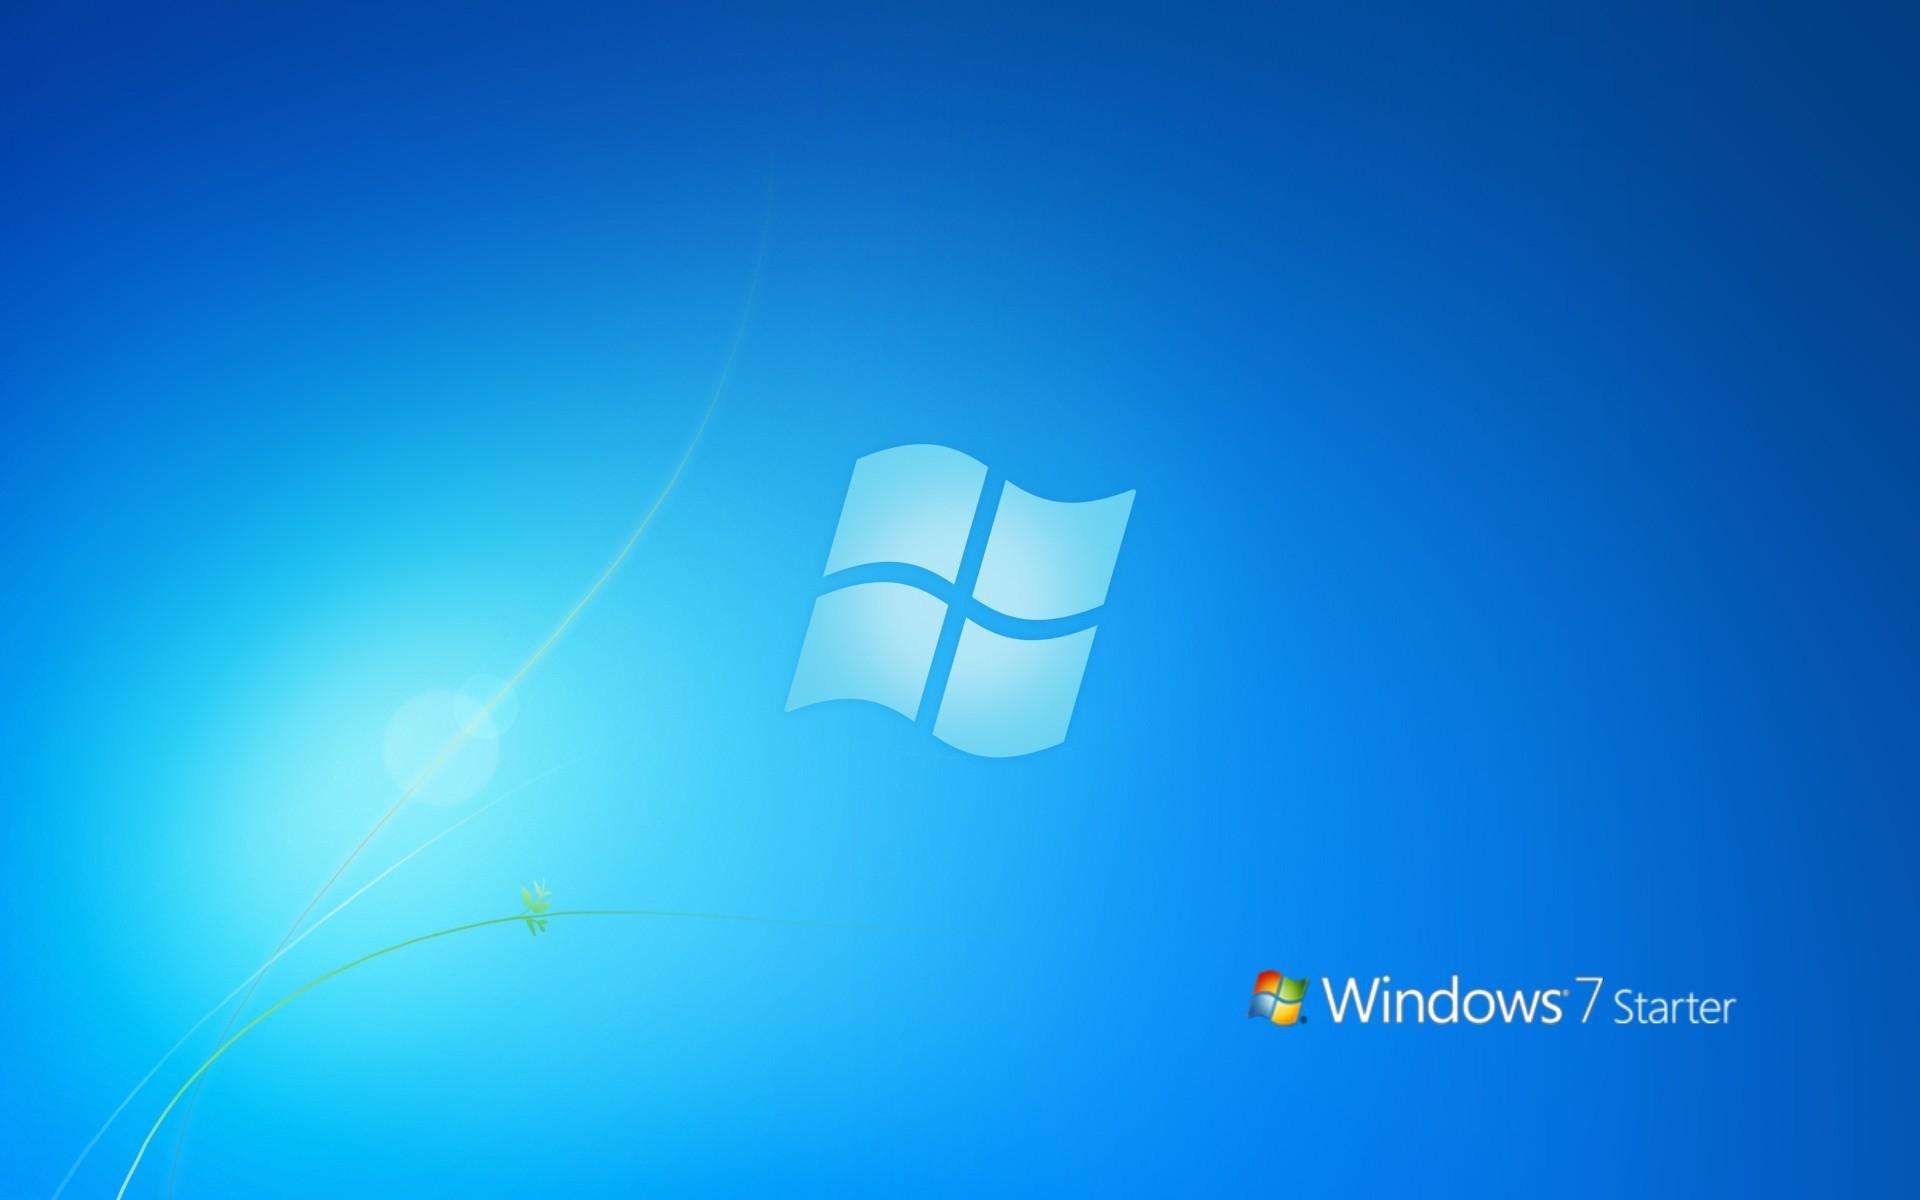 Windows vista desktop wallpaper slideshow 49 images - Car wallpaper for windows xp ...